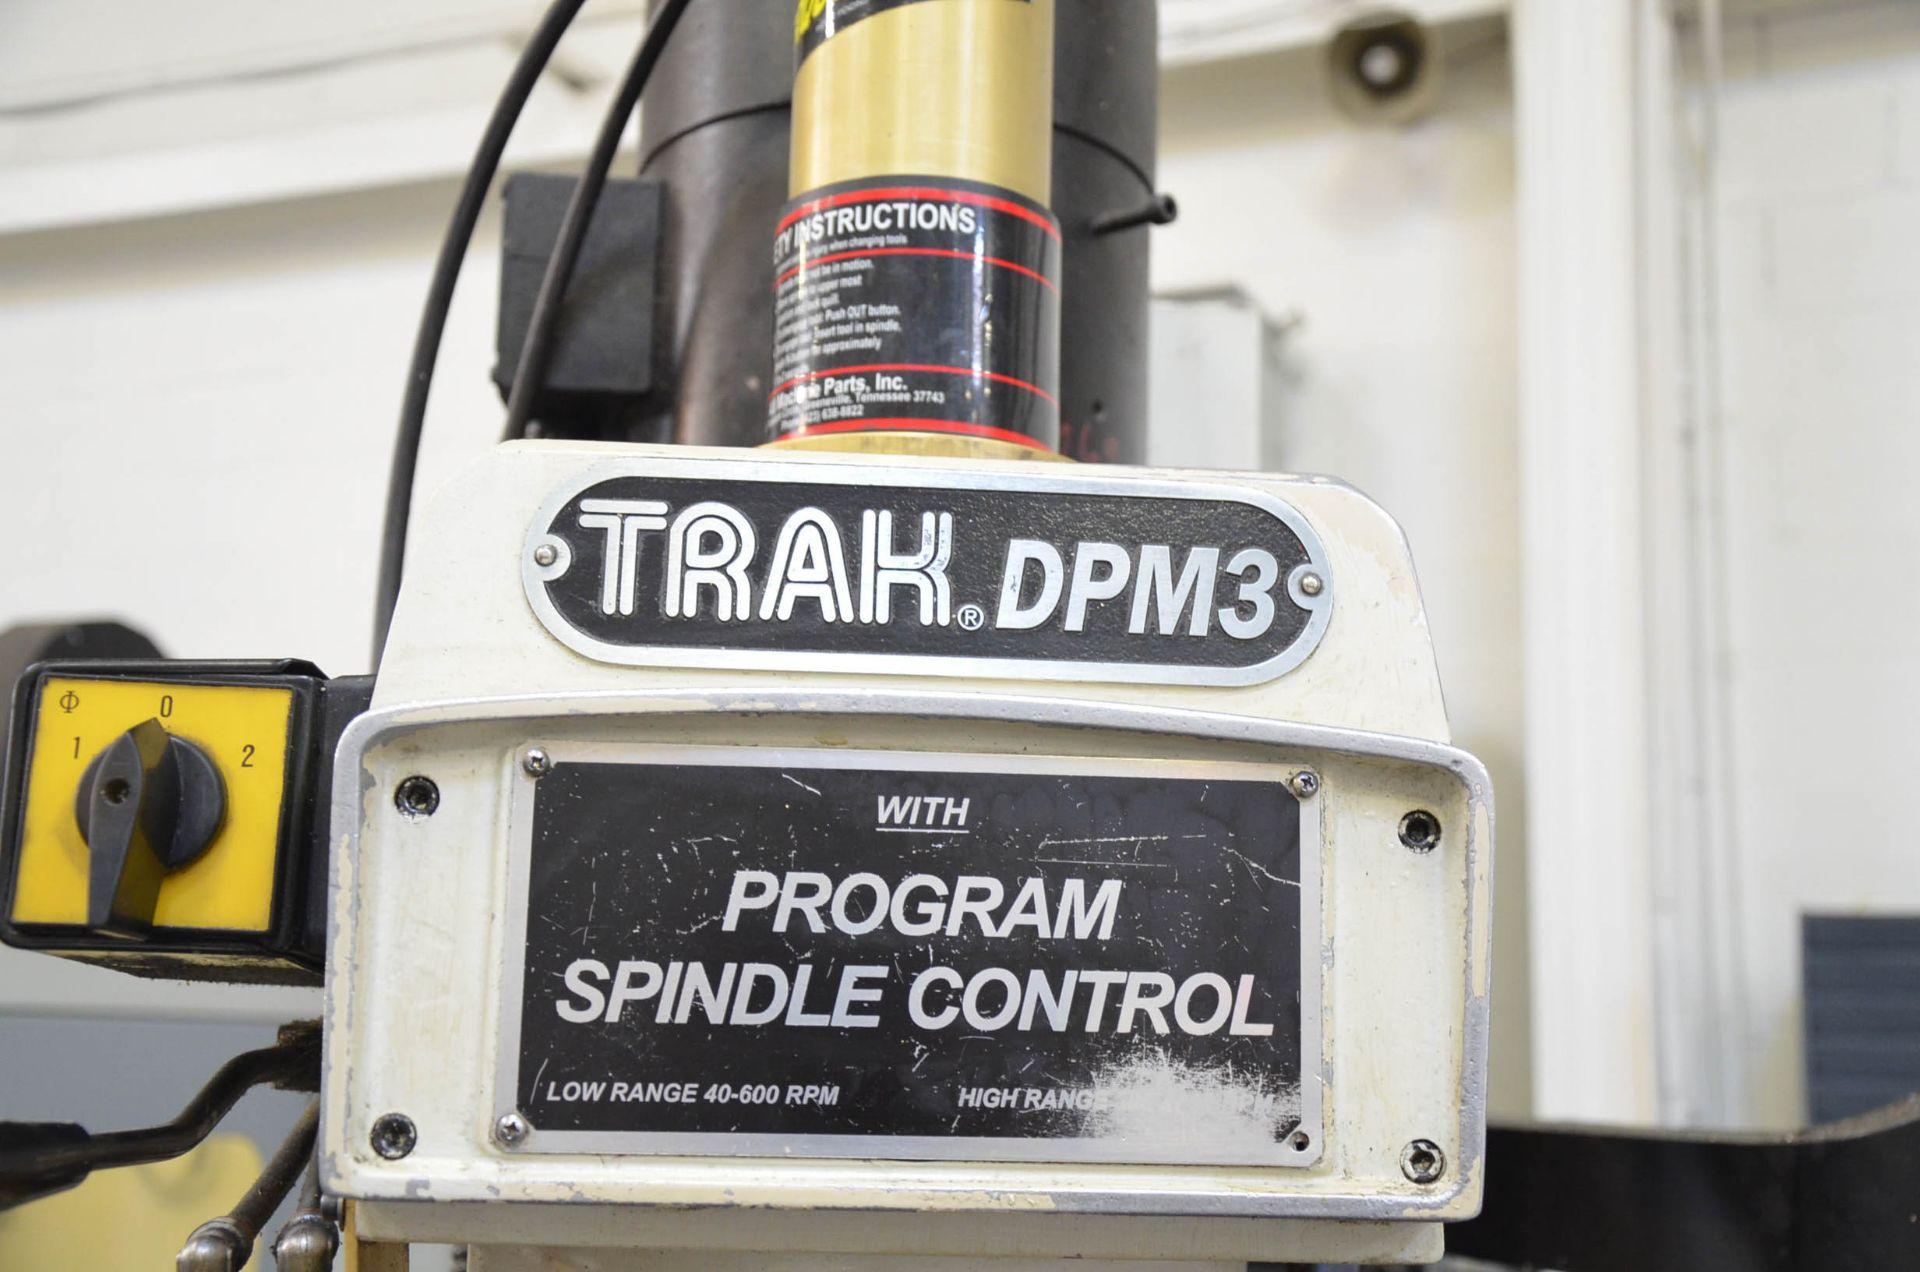 "TRAK DPM3 CNC VERTICAL TURRET MILLING MACHINE WITH PROTO TRAK (2016) SMX CNC CONTROL, 10"" X 50"" - Image 4 of 10"